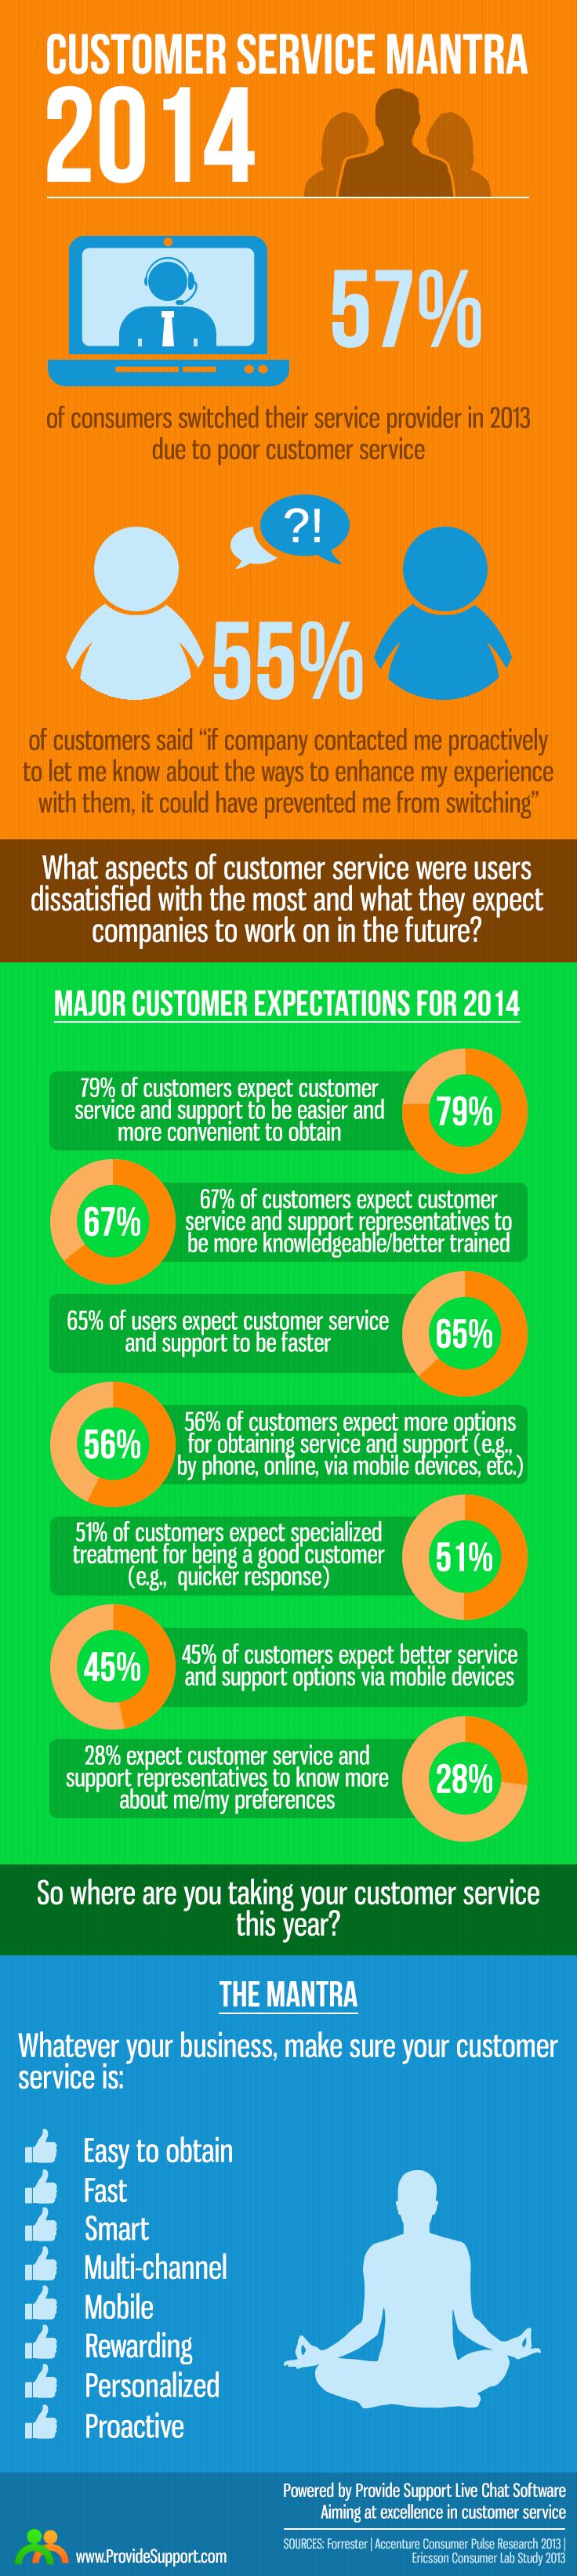 Customer Service Mantra